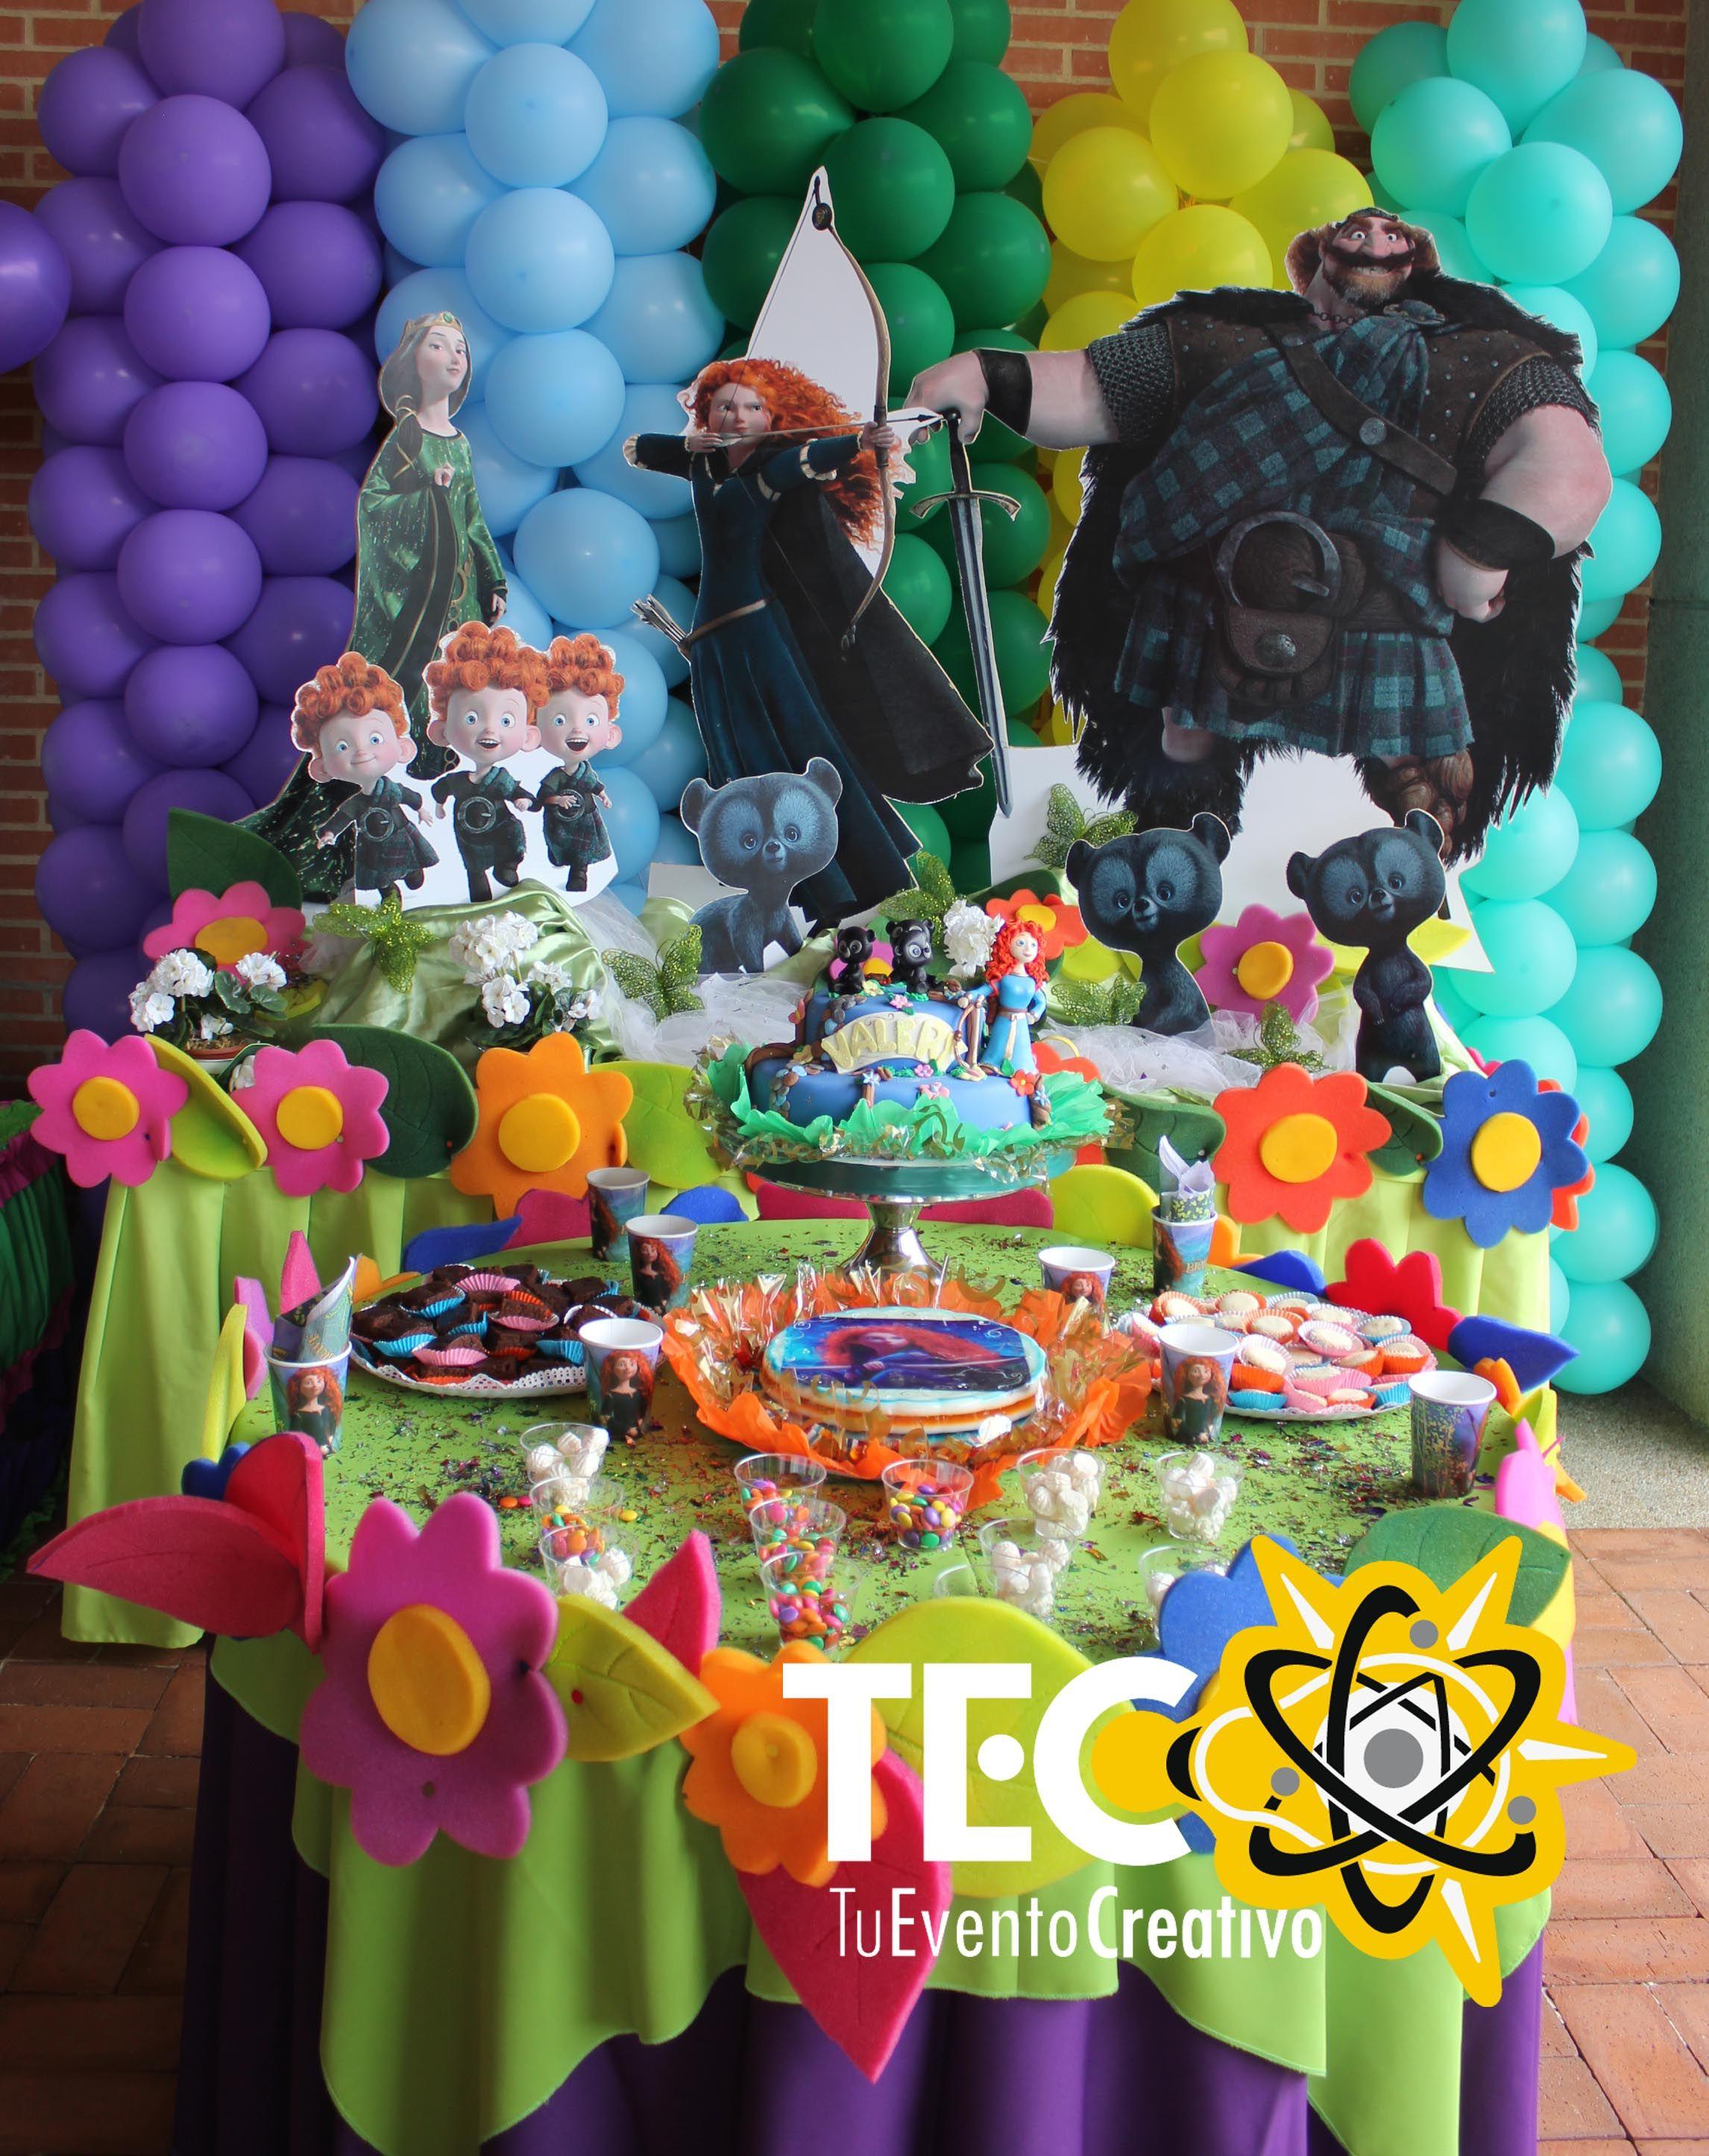 Brave decoration decoracion de valiente mesa de la torta for Decoracion de tortas infantiles